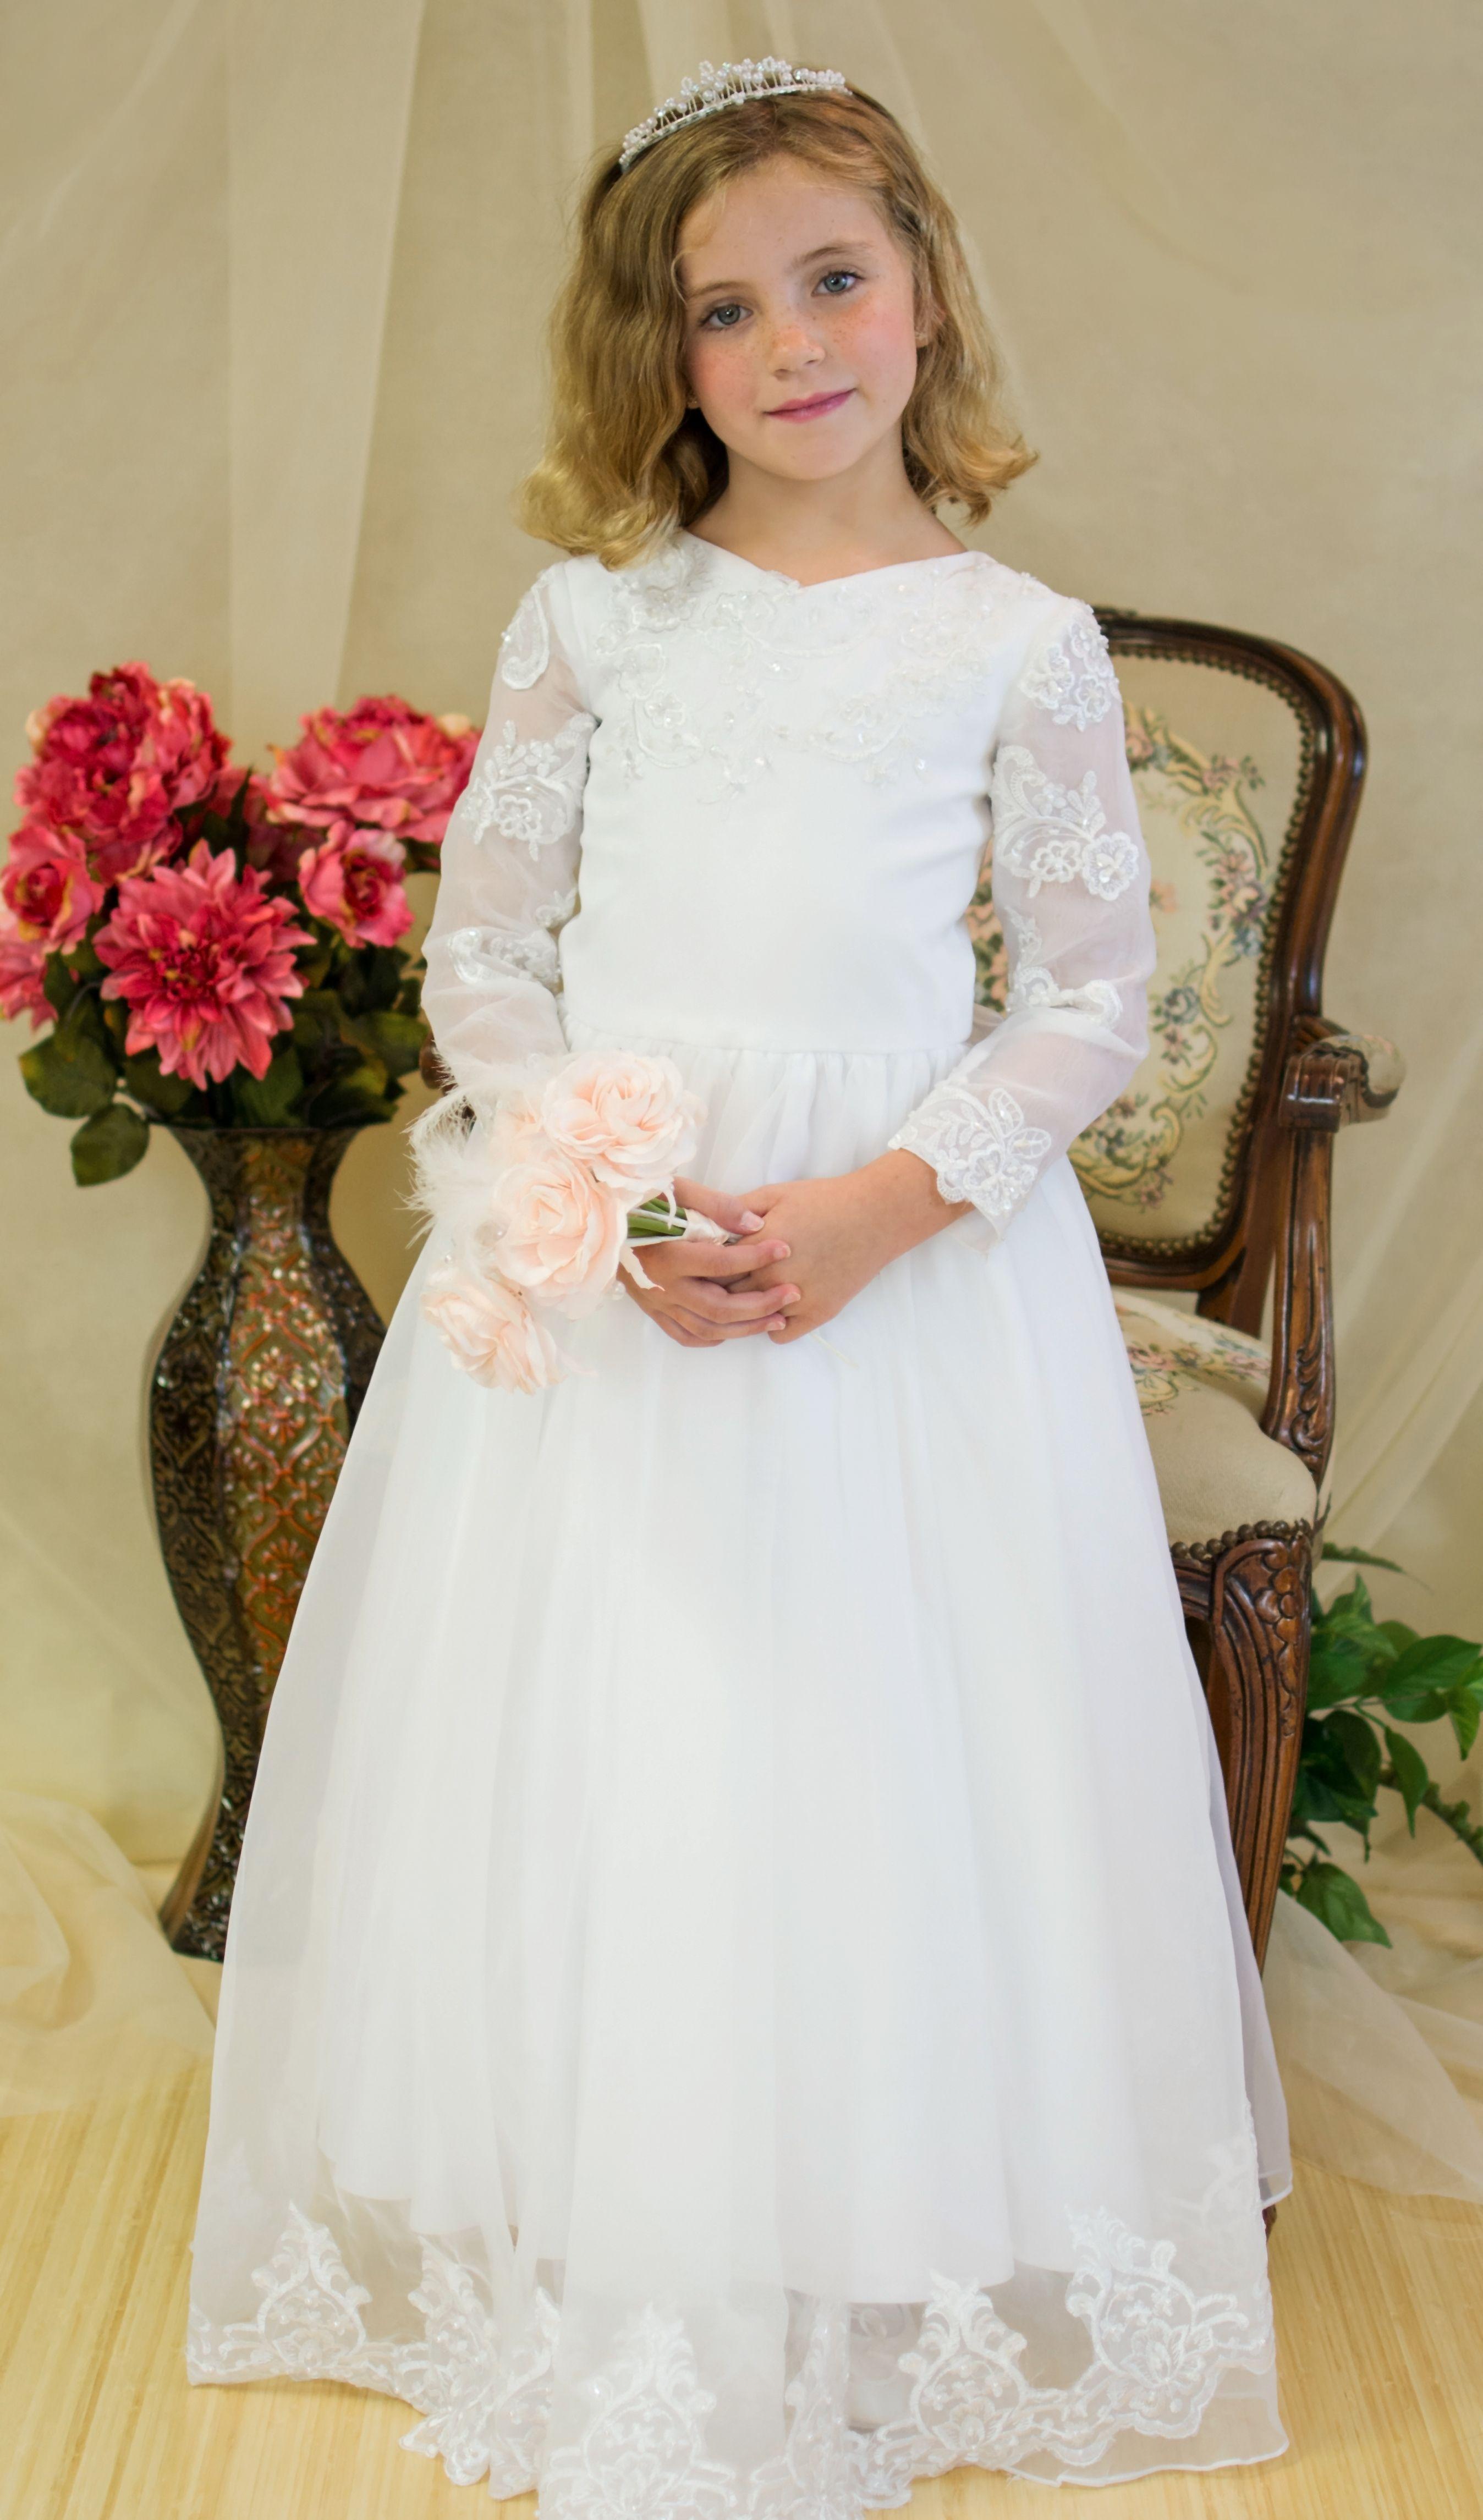 Long Sleeve First Communion Dress W Option Train Style X5073 First Communion Dresses Communion Dresses Girls Communion Dresses [ 4582 x 2696 Pixel ]